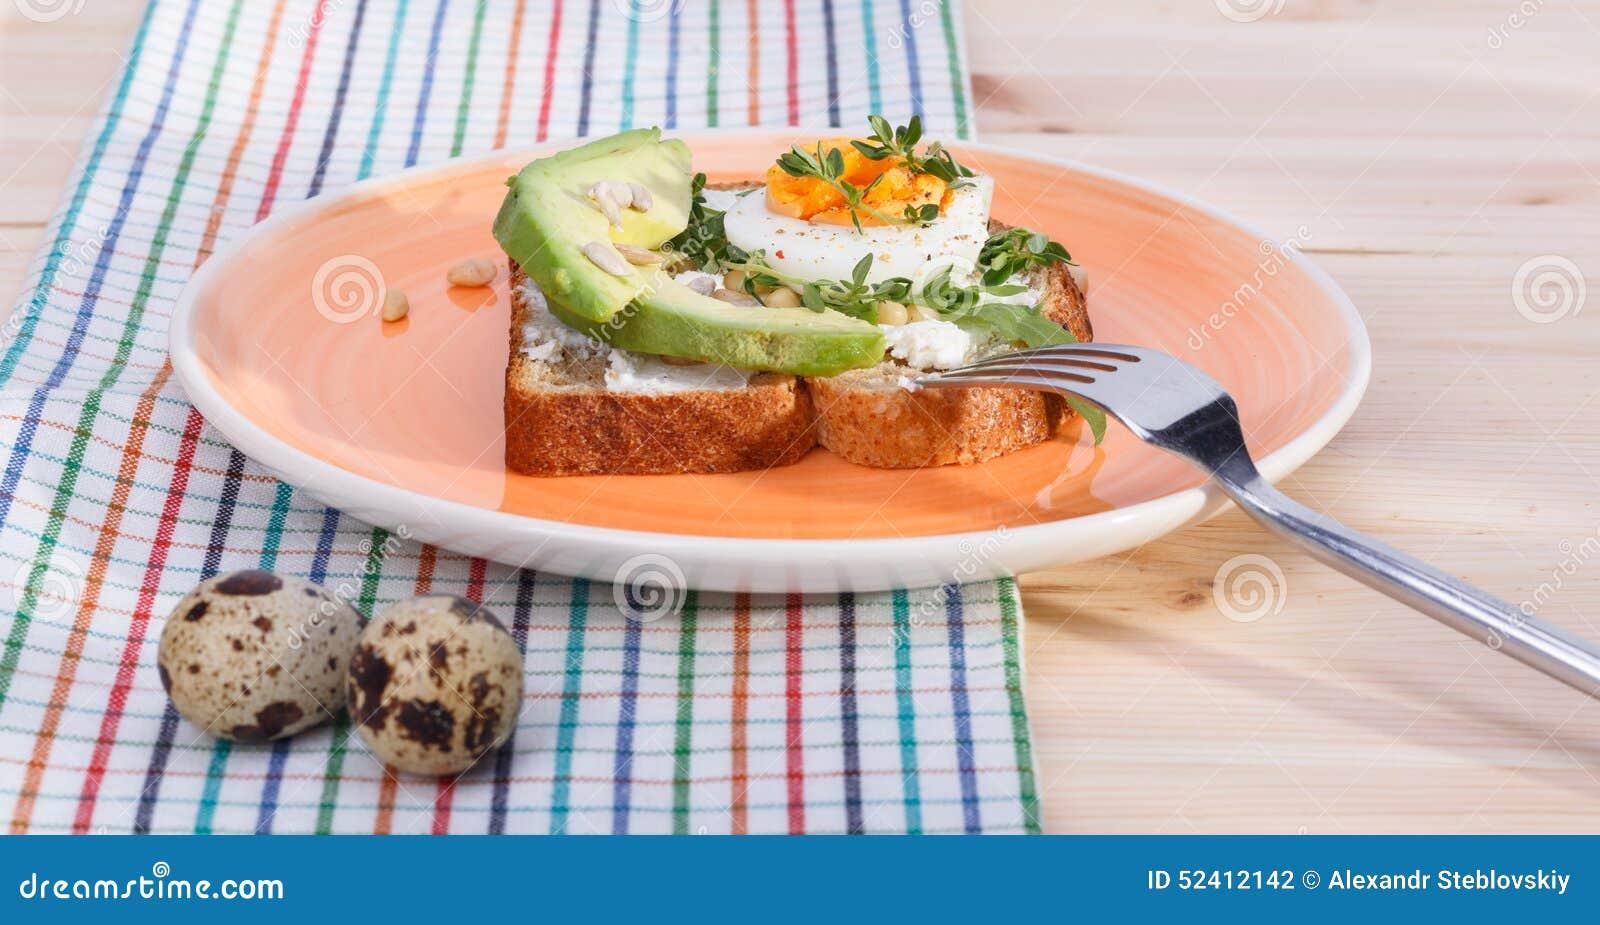 avocado and orange sandwich recipes dishmaps avocado and orange ...